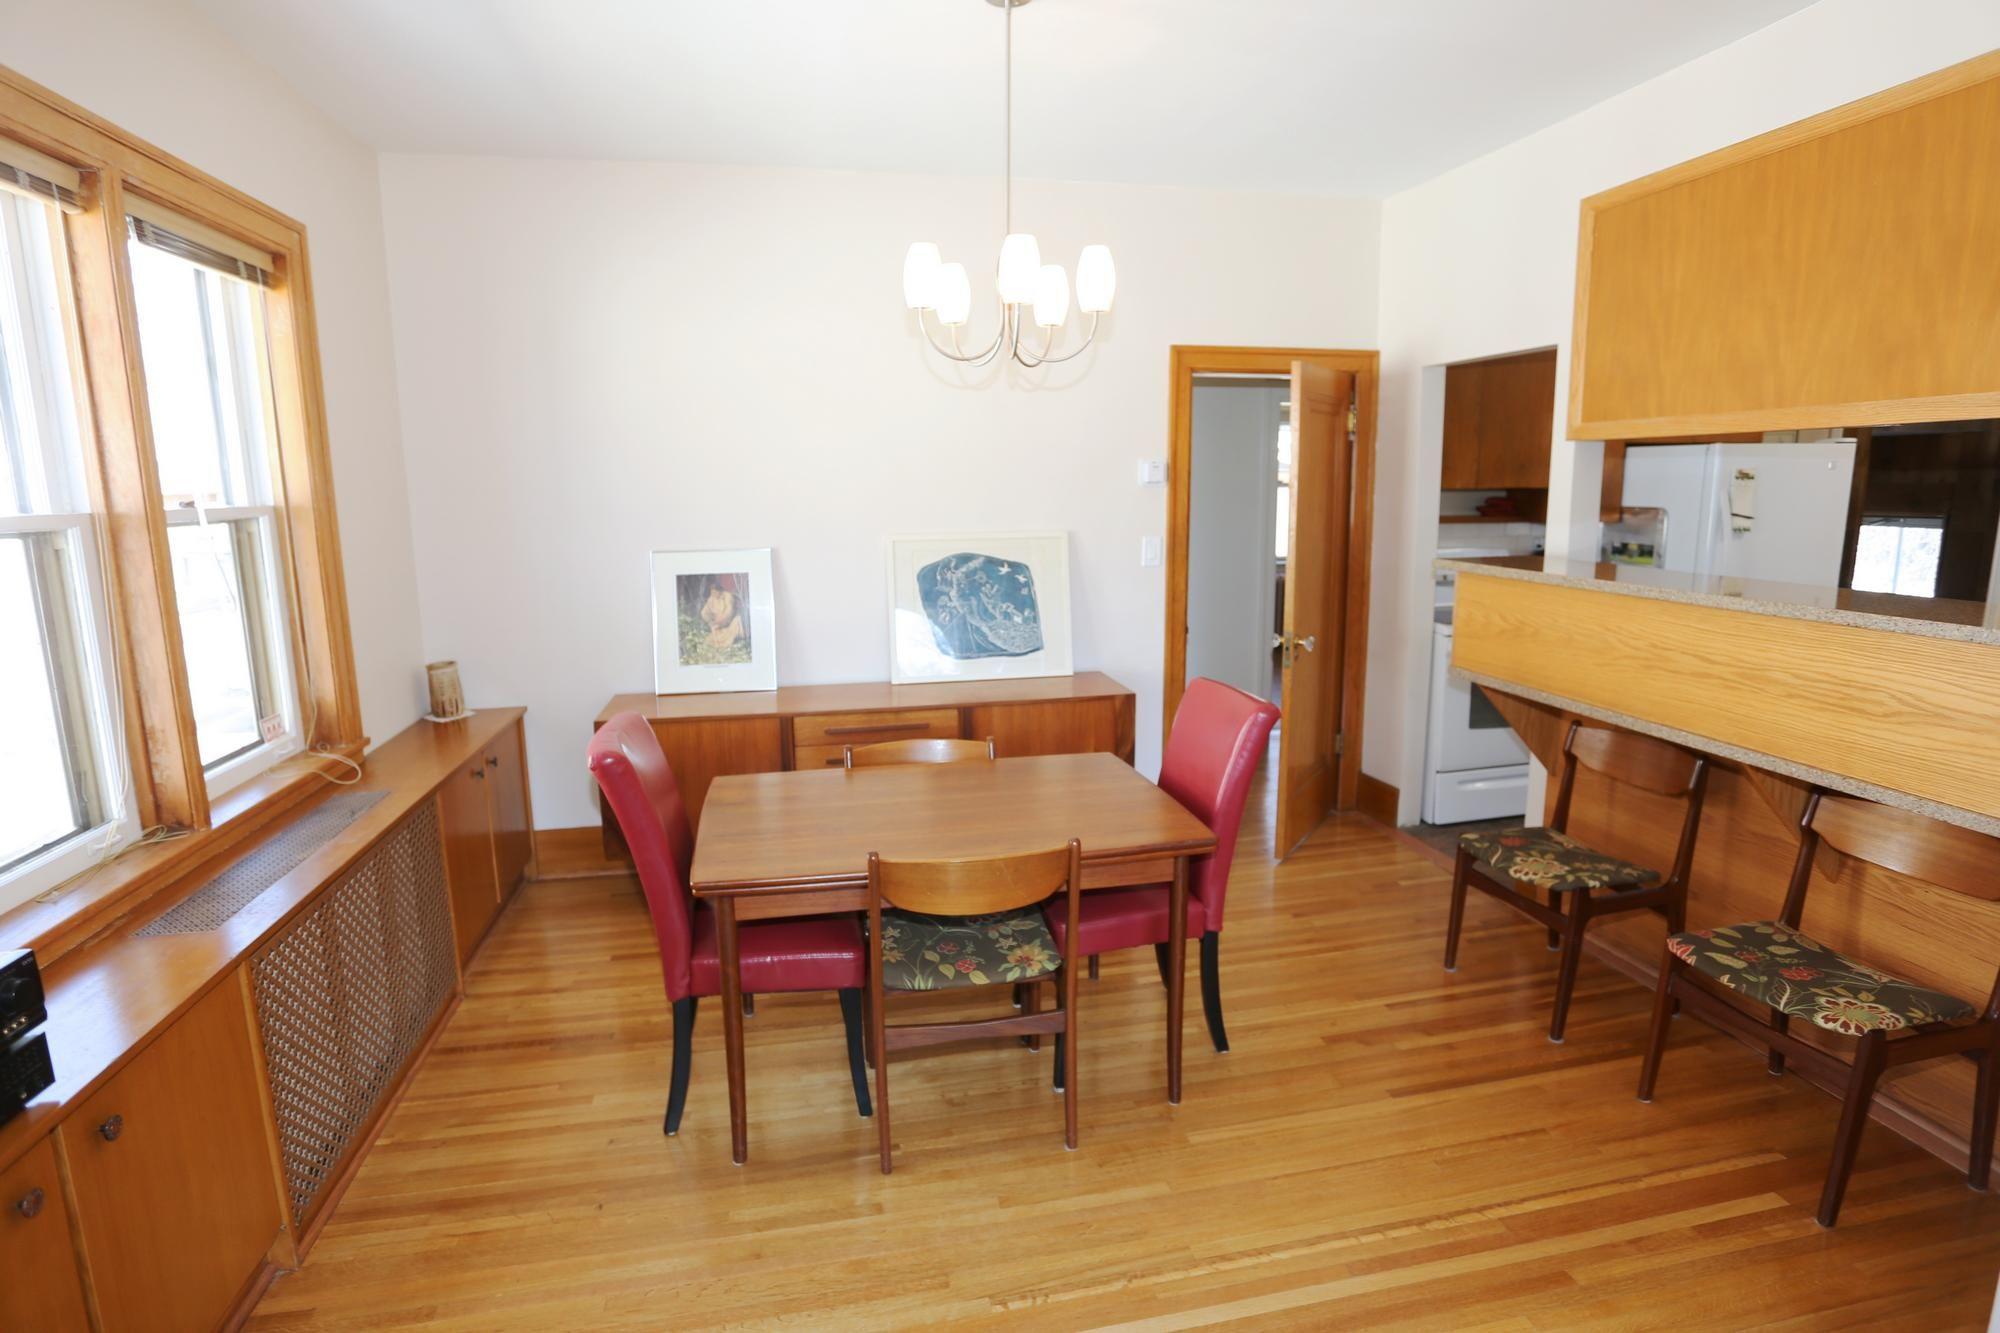 Photo 9: Photos: 109 Garfield Street South in Winnipeg: Wolseley Single Family Detached for sale (5B)  : MLS®# 1808340